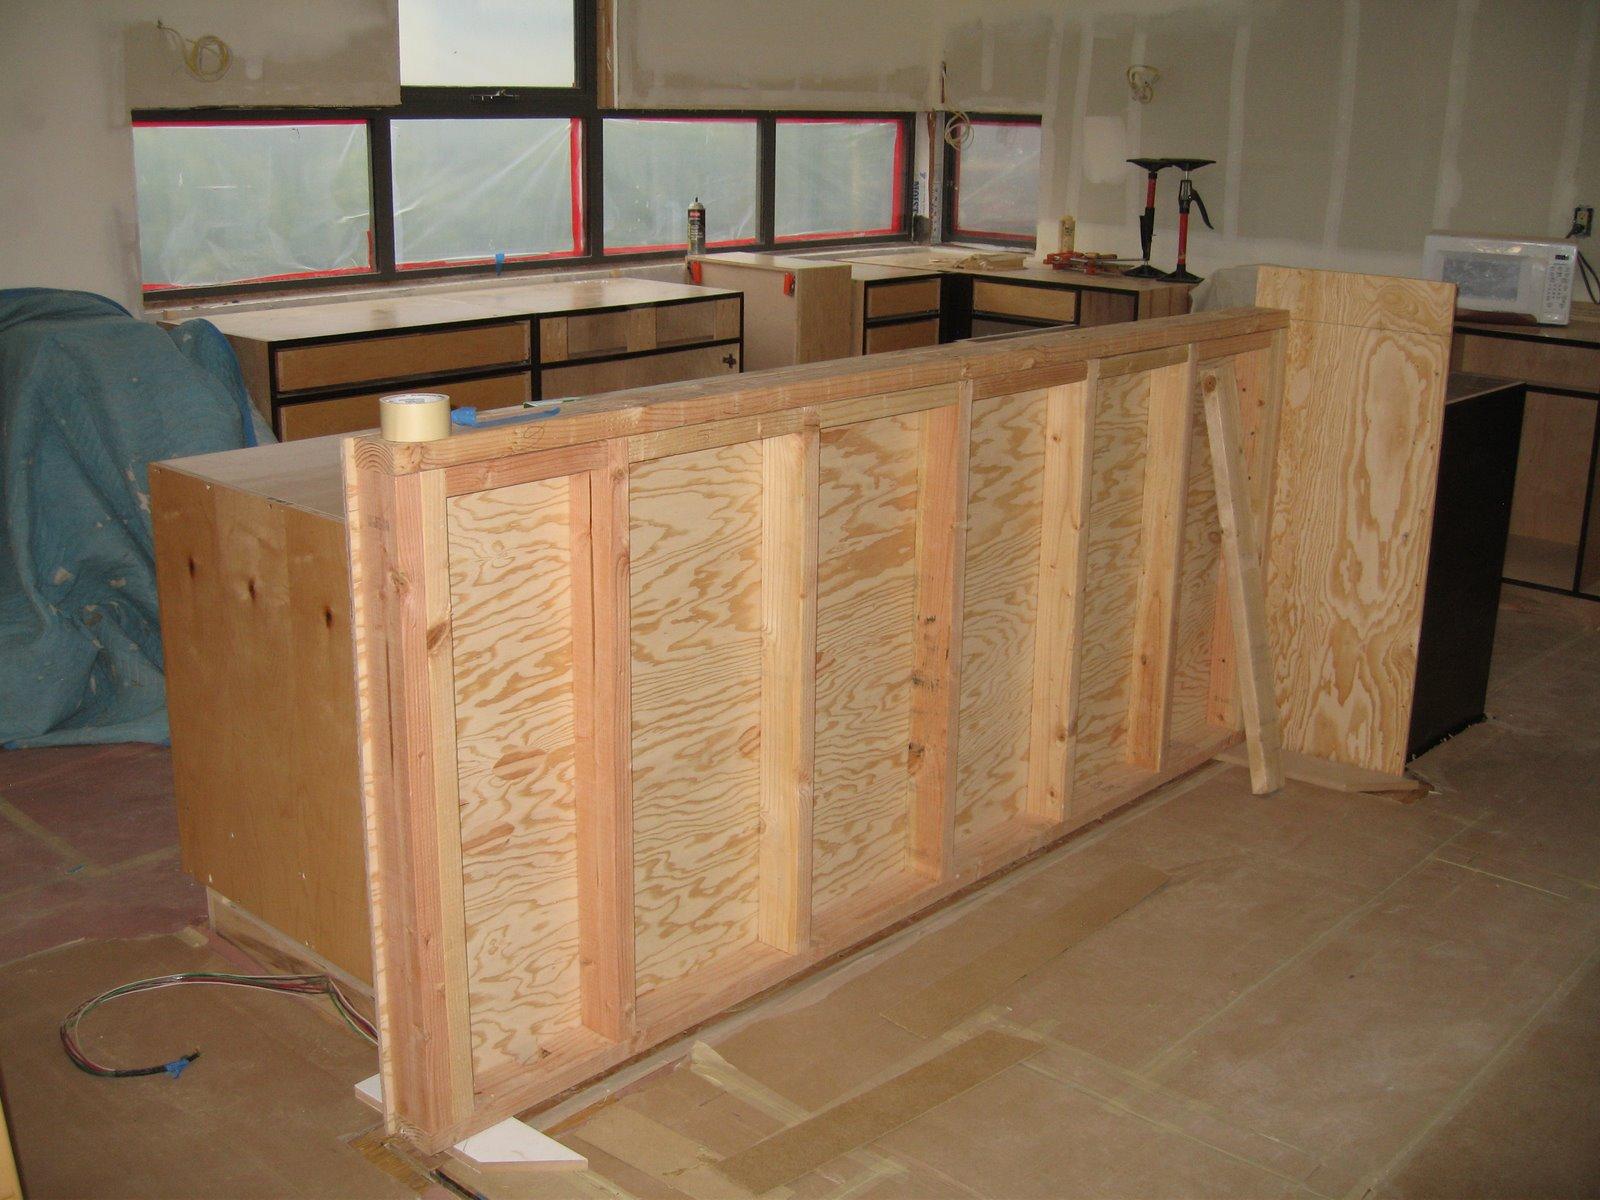 Floating Island Base Kitchen Cabinet : Pope street modern scratch coat more cabinets